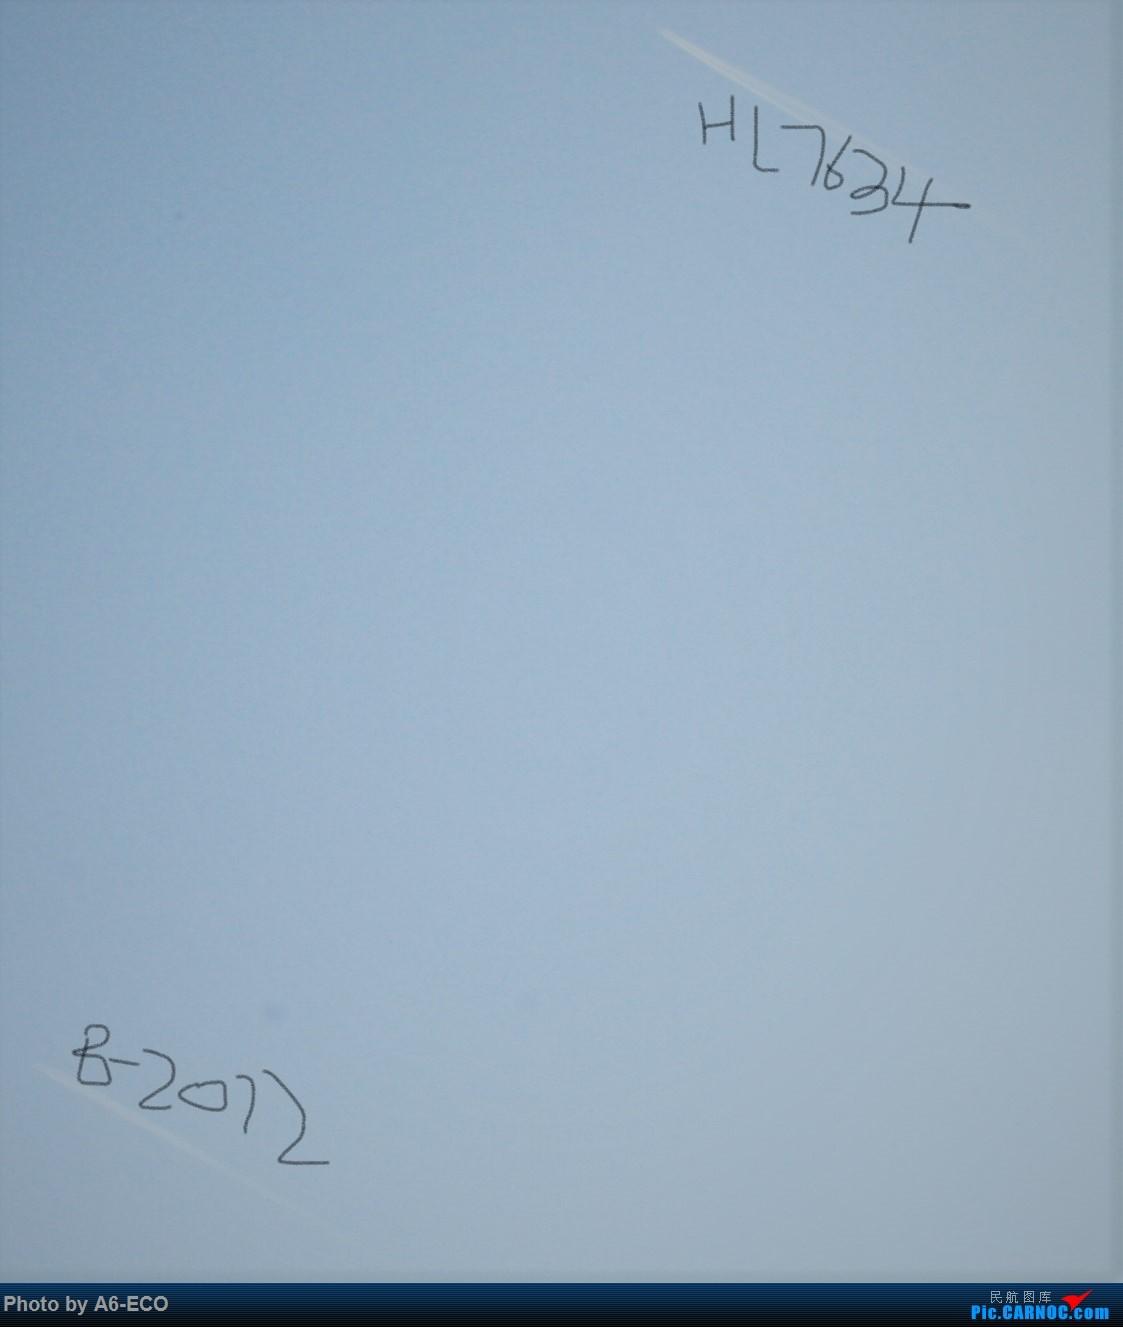 Re:[原创]今天运气极好,云南孔雀,B-1070,2个菜航邮戳,泡菜航彩绘,东航邮戳......